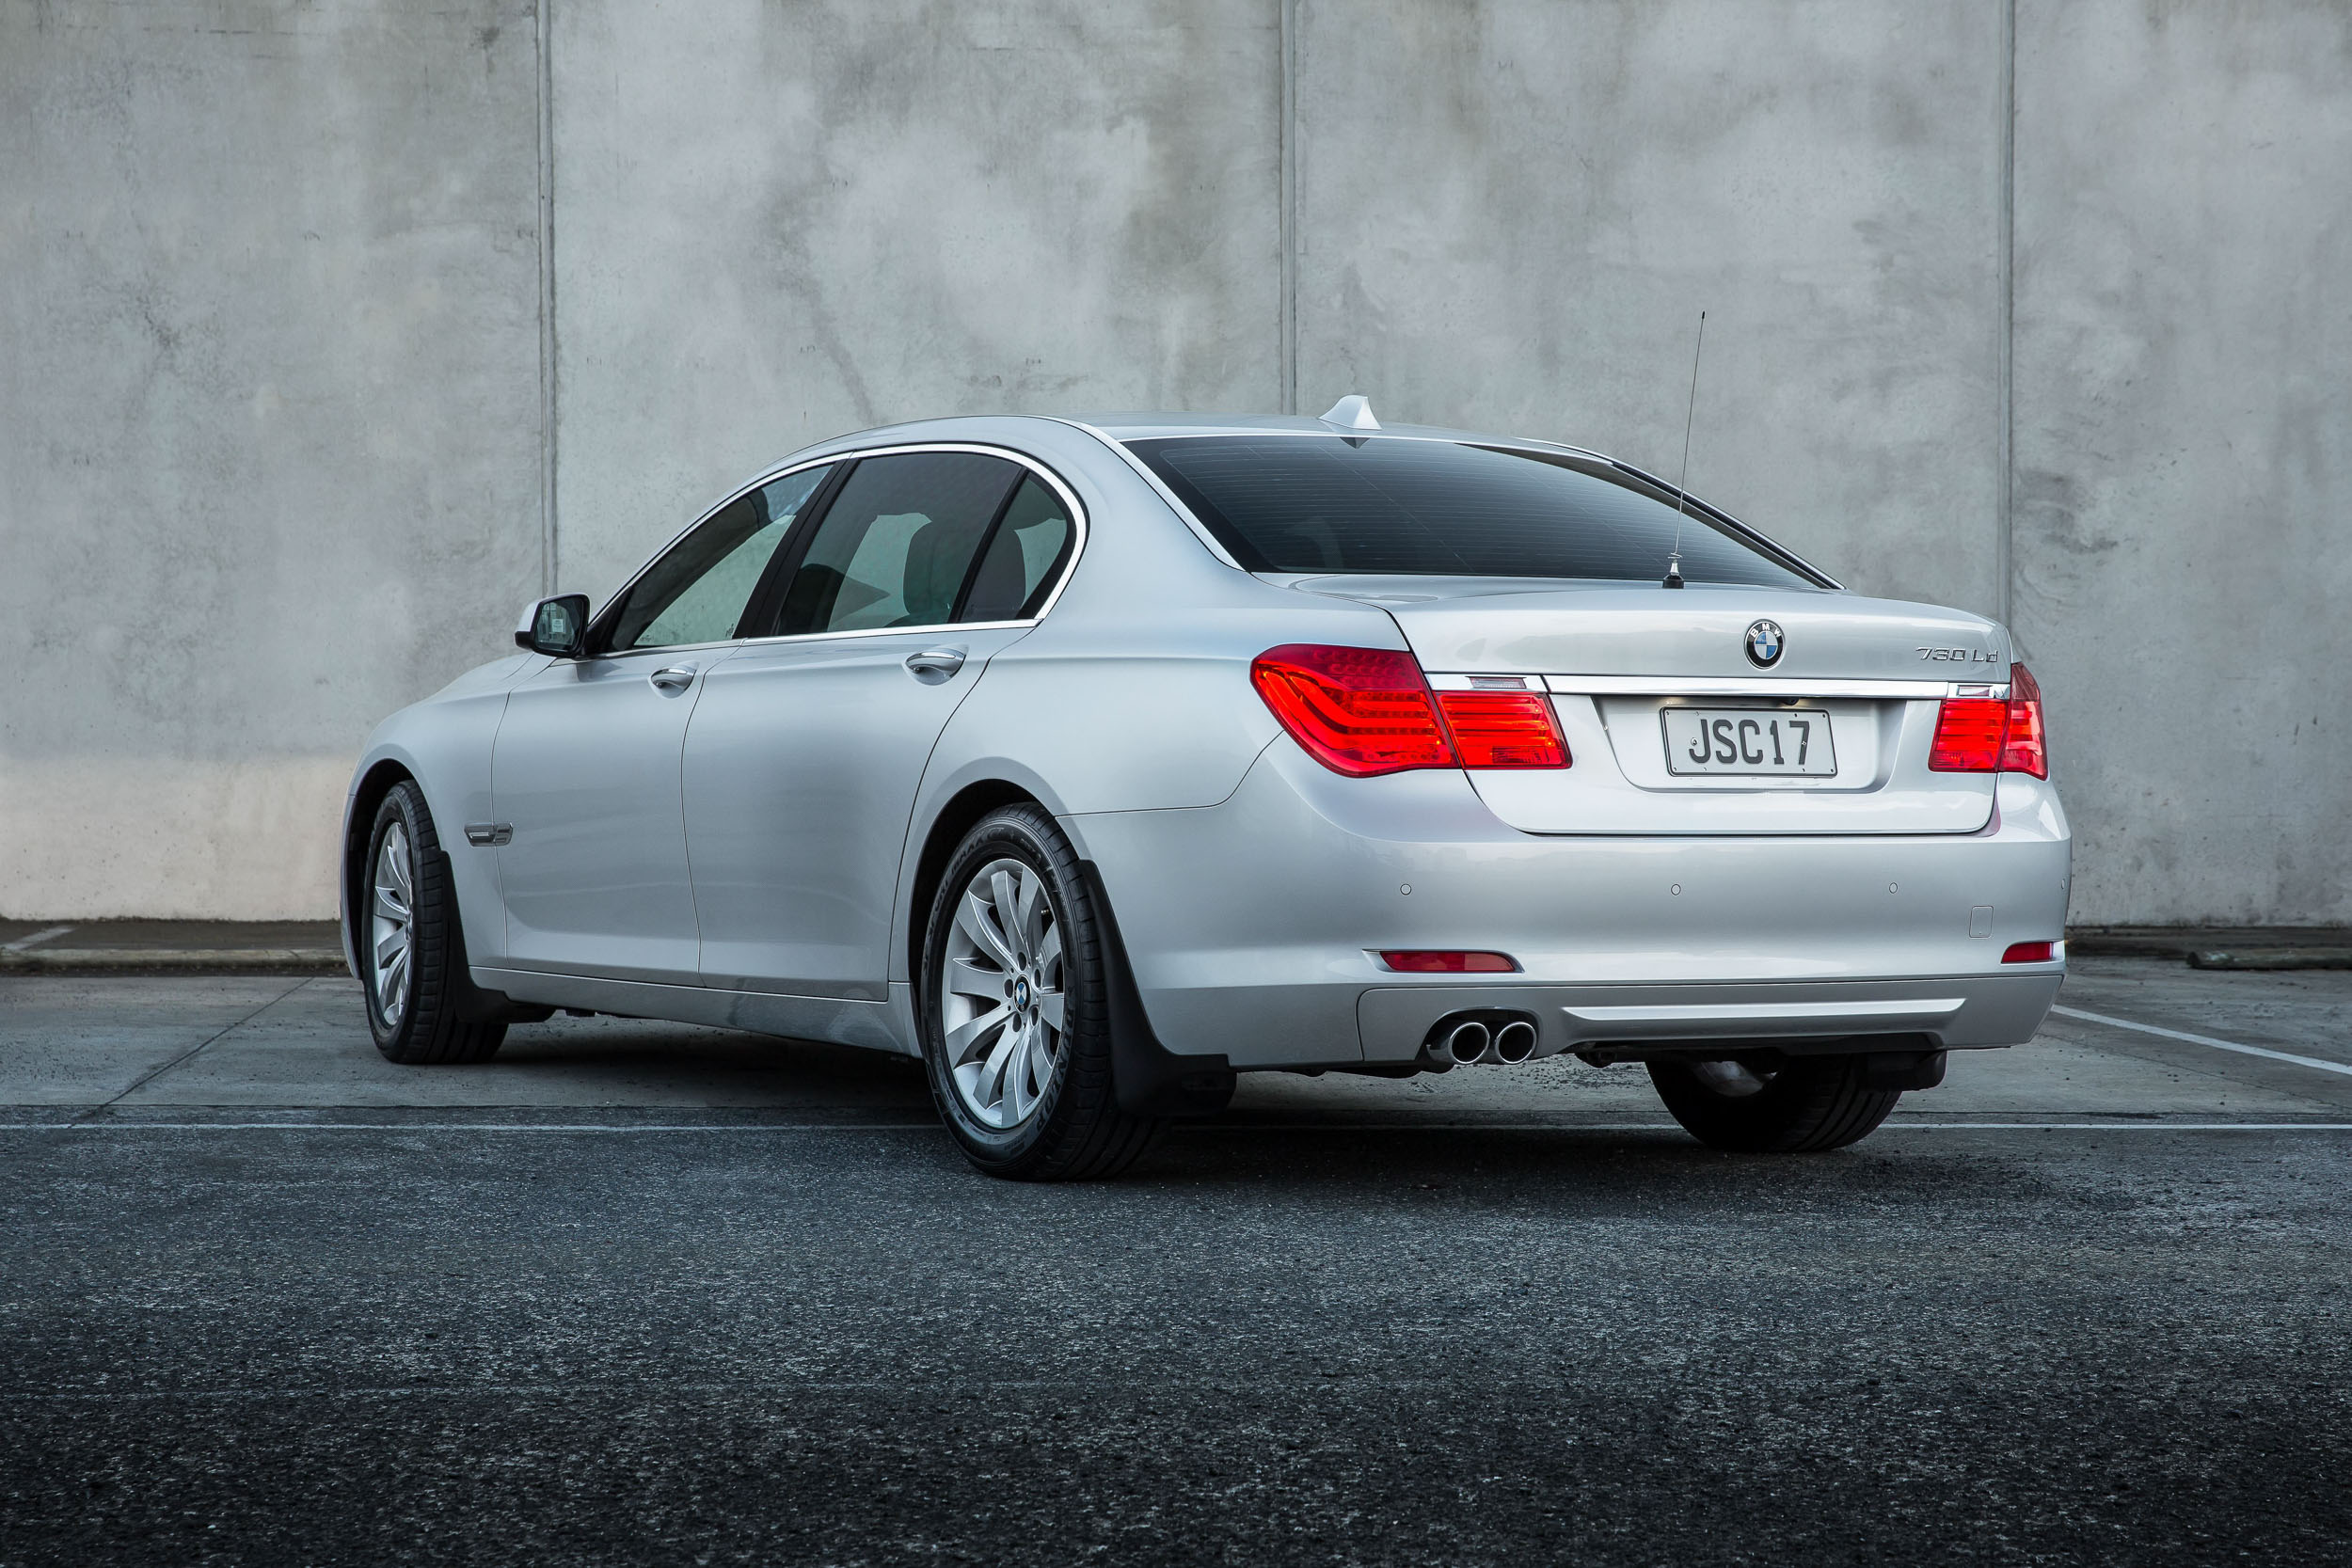 BMW 730d Rear quarter - web resolution.jpg